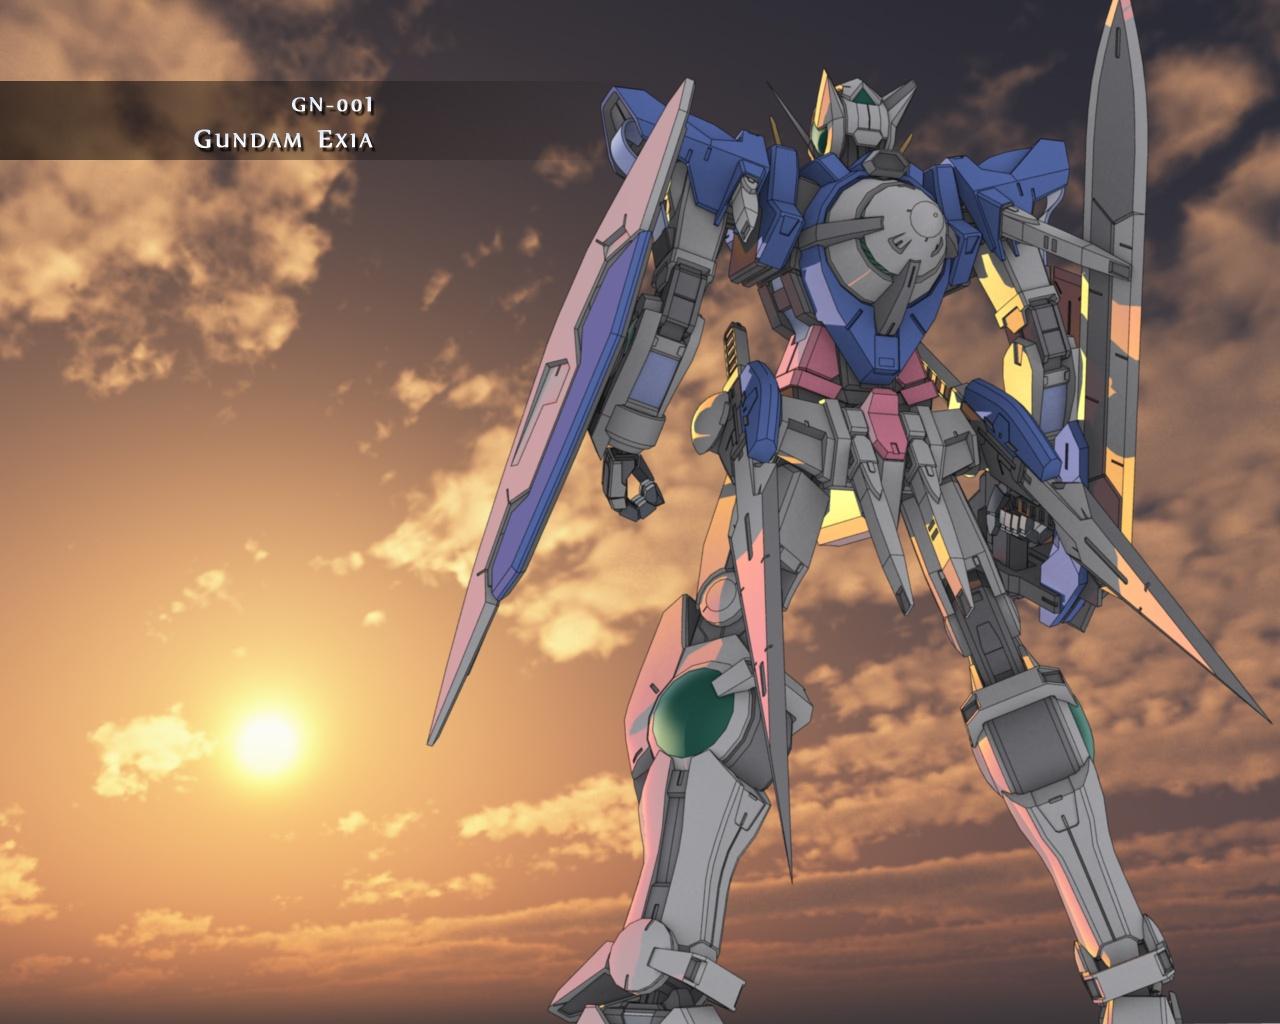 Gundam 00 Wallpaper 1280x1024 Gundam 00 1280x1024